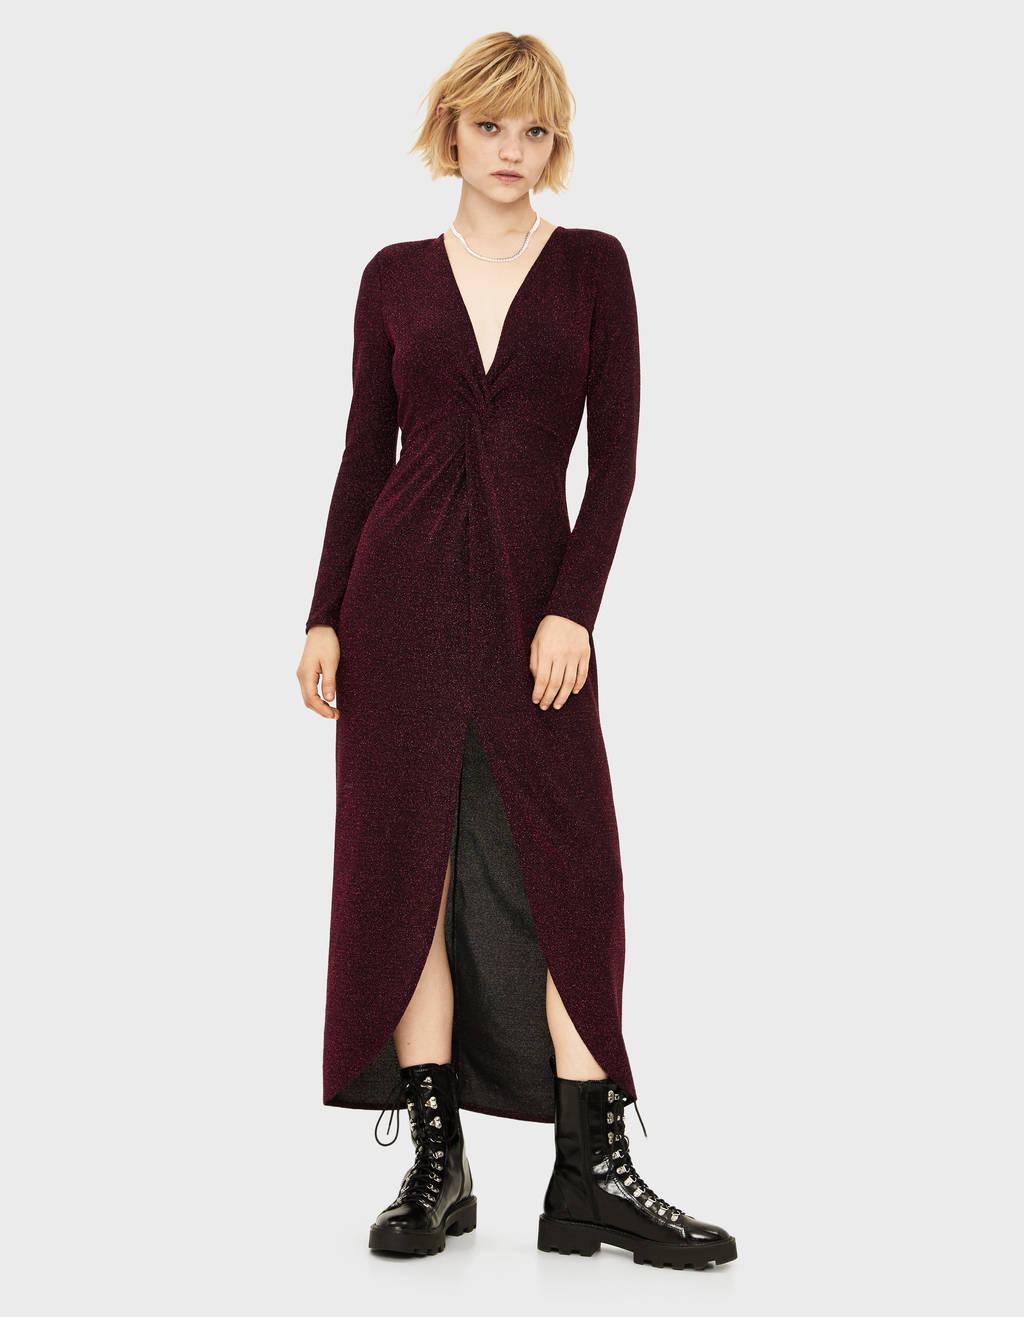 Long metallic thread dress